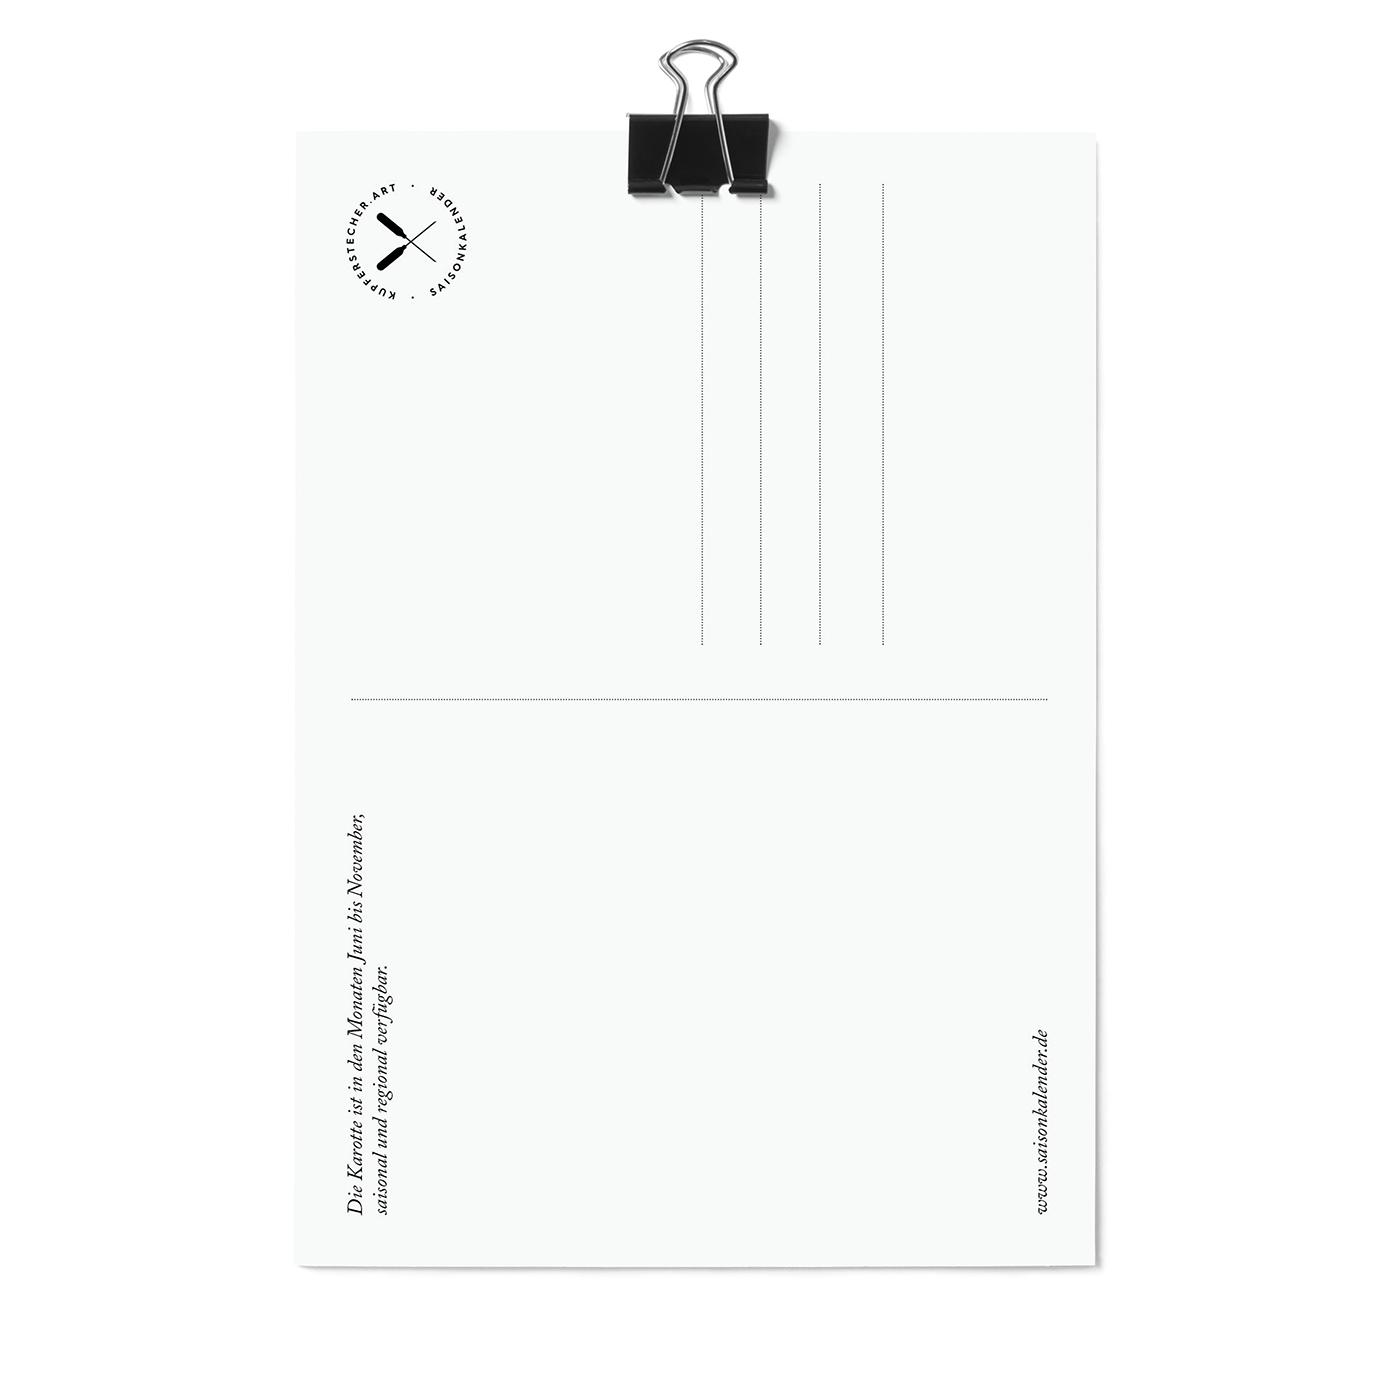 Postkarte, Karotte